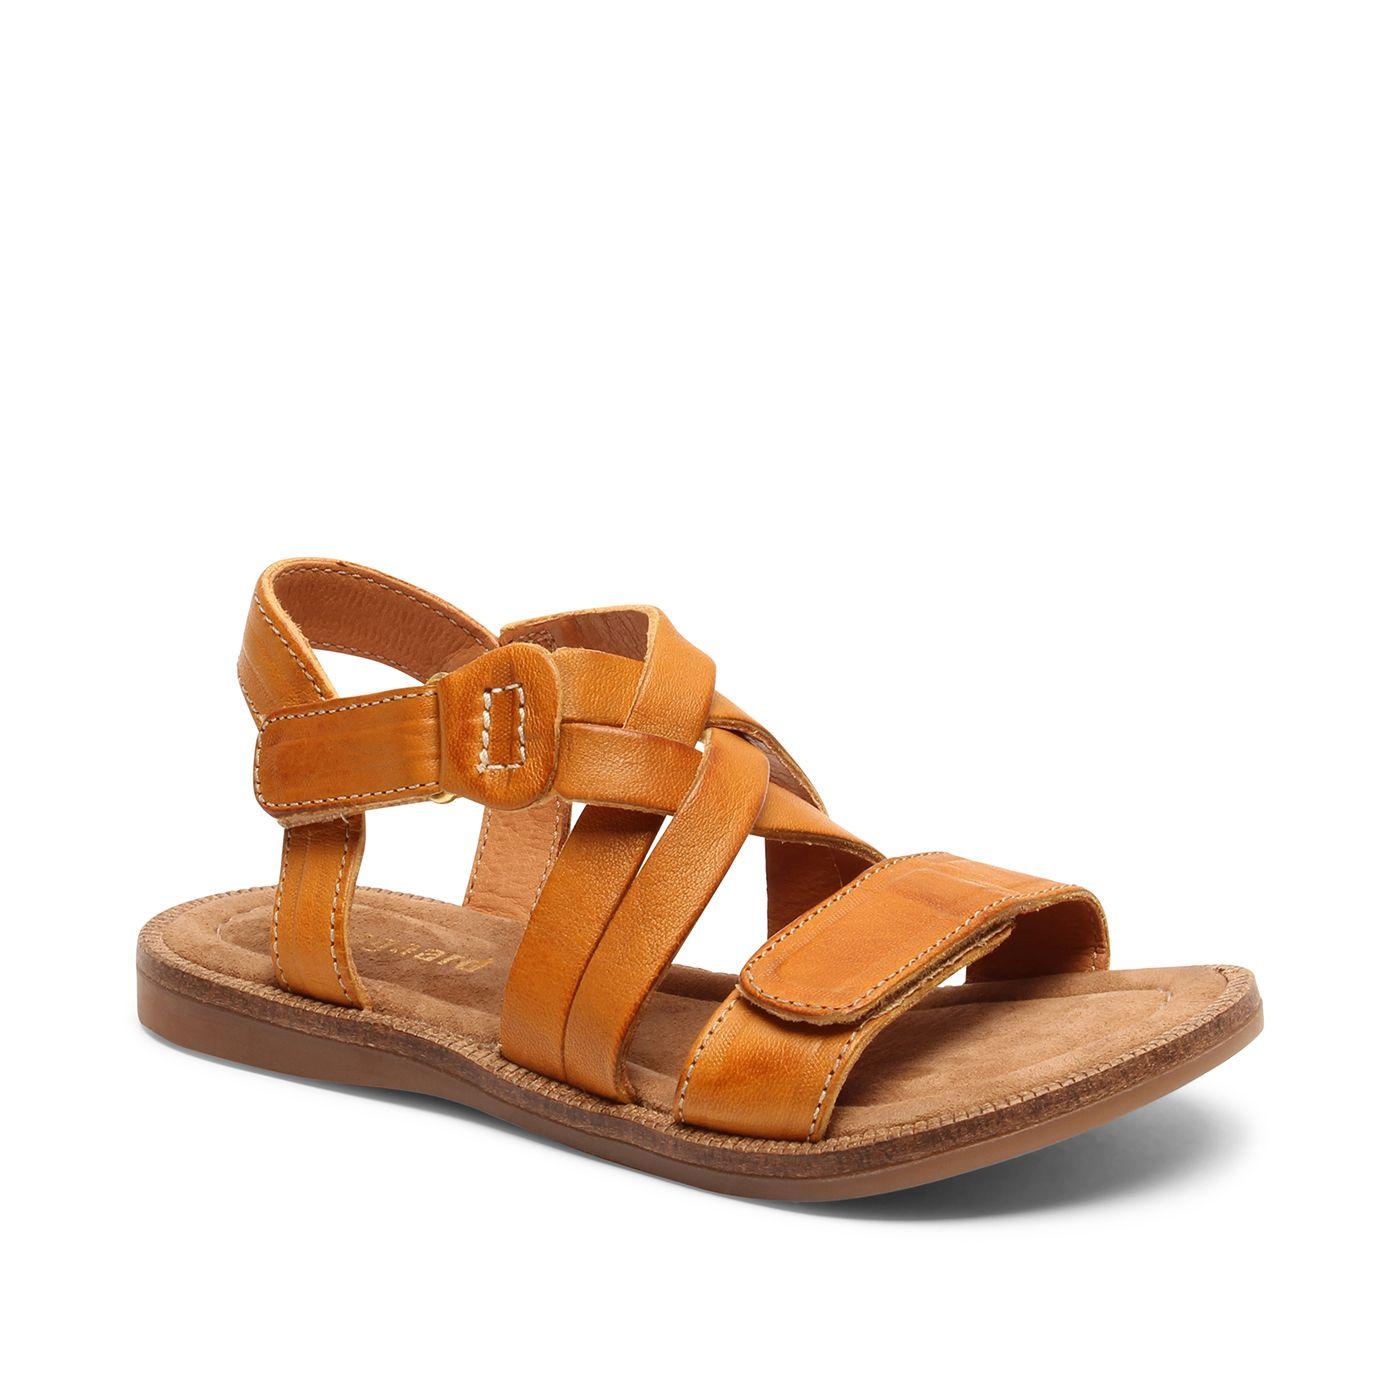 Bisgaard dívčí kožené sandály 71946 - 2112